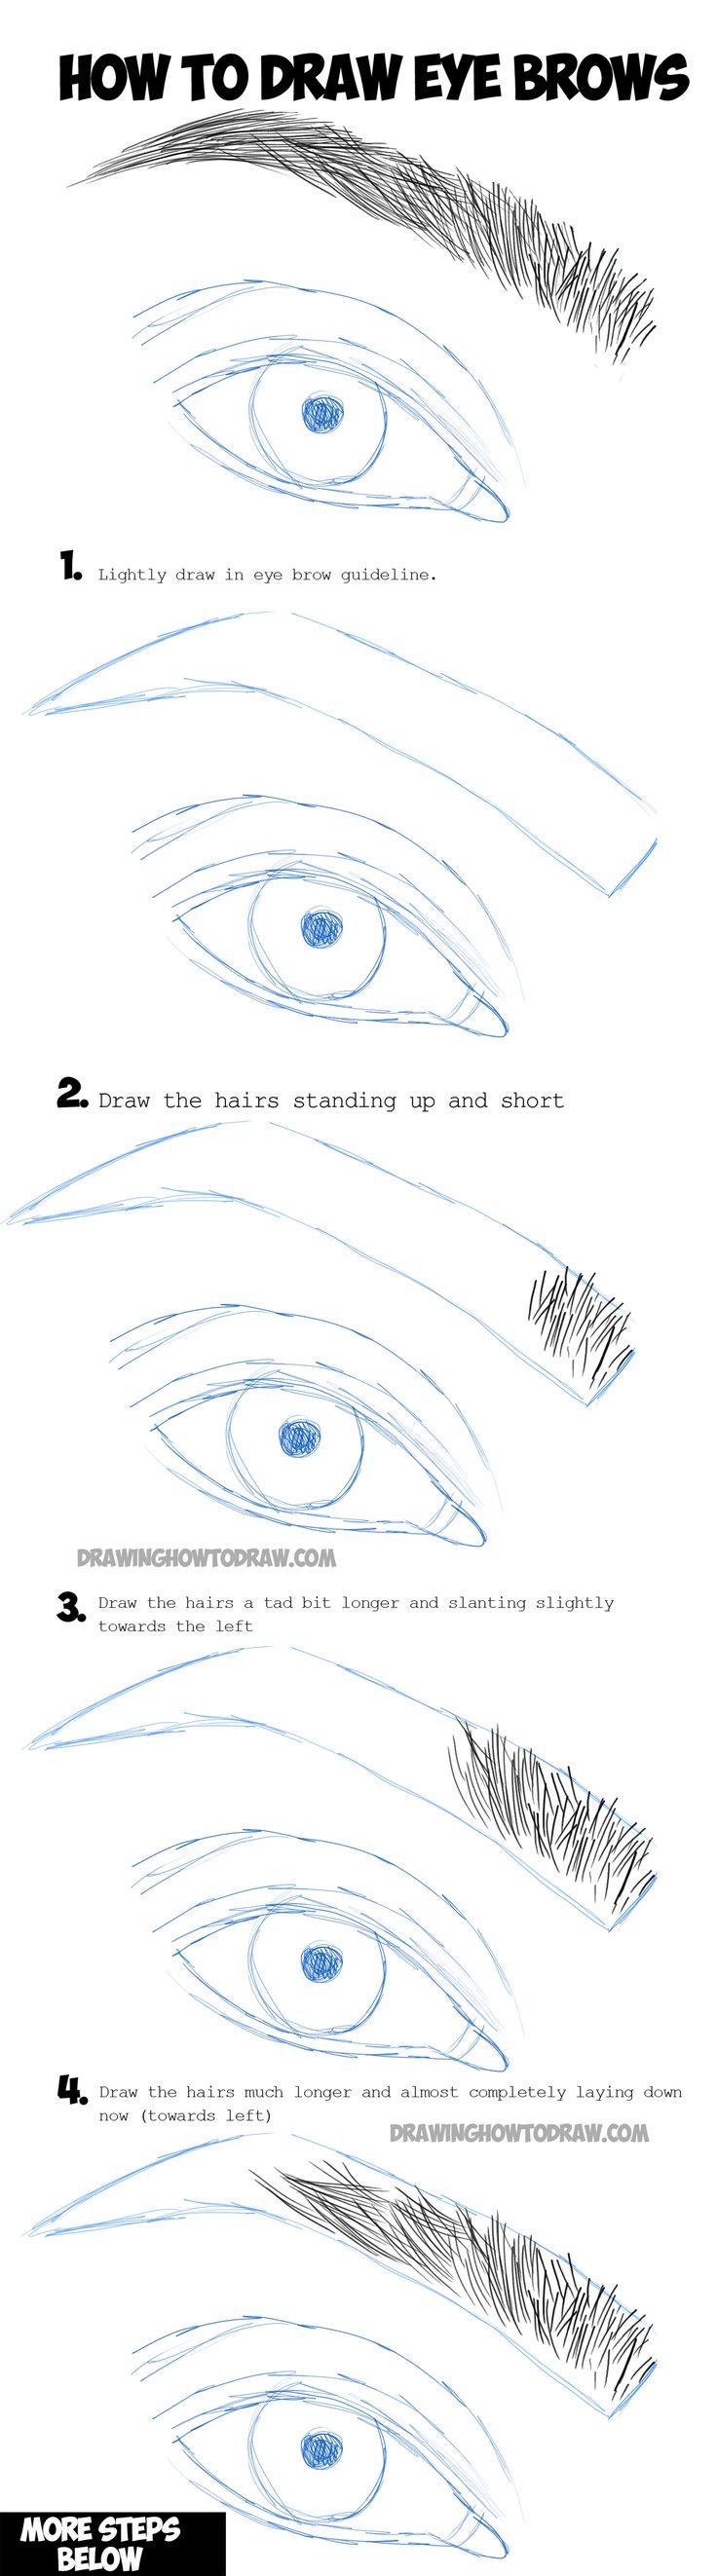 Apprendre à dessiner un sourcil @Maaalaury_